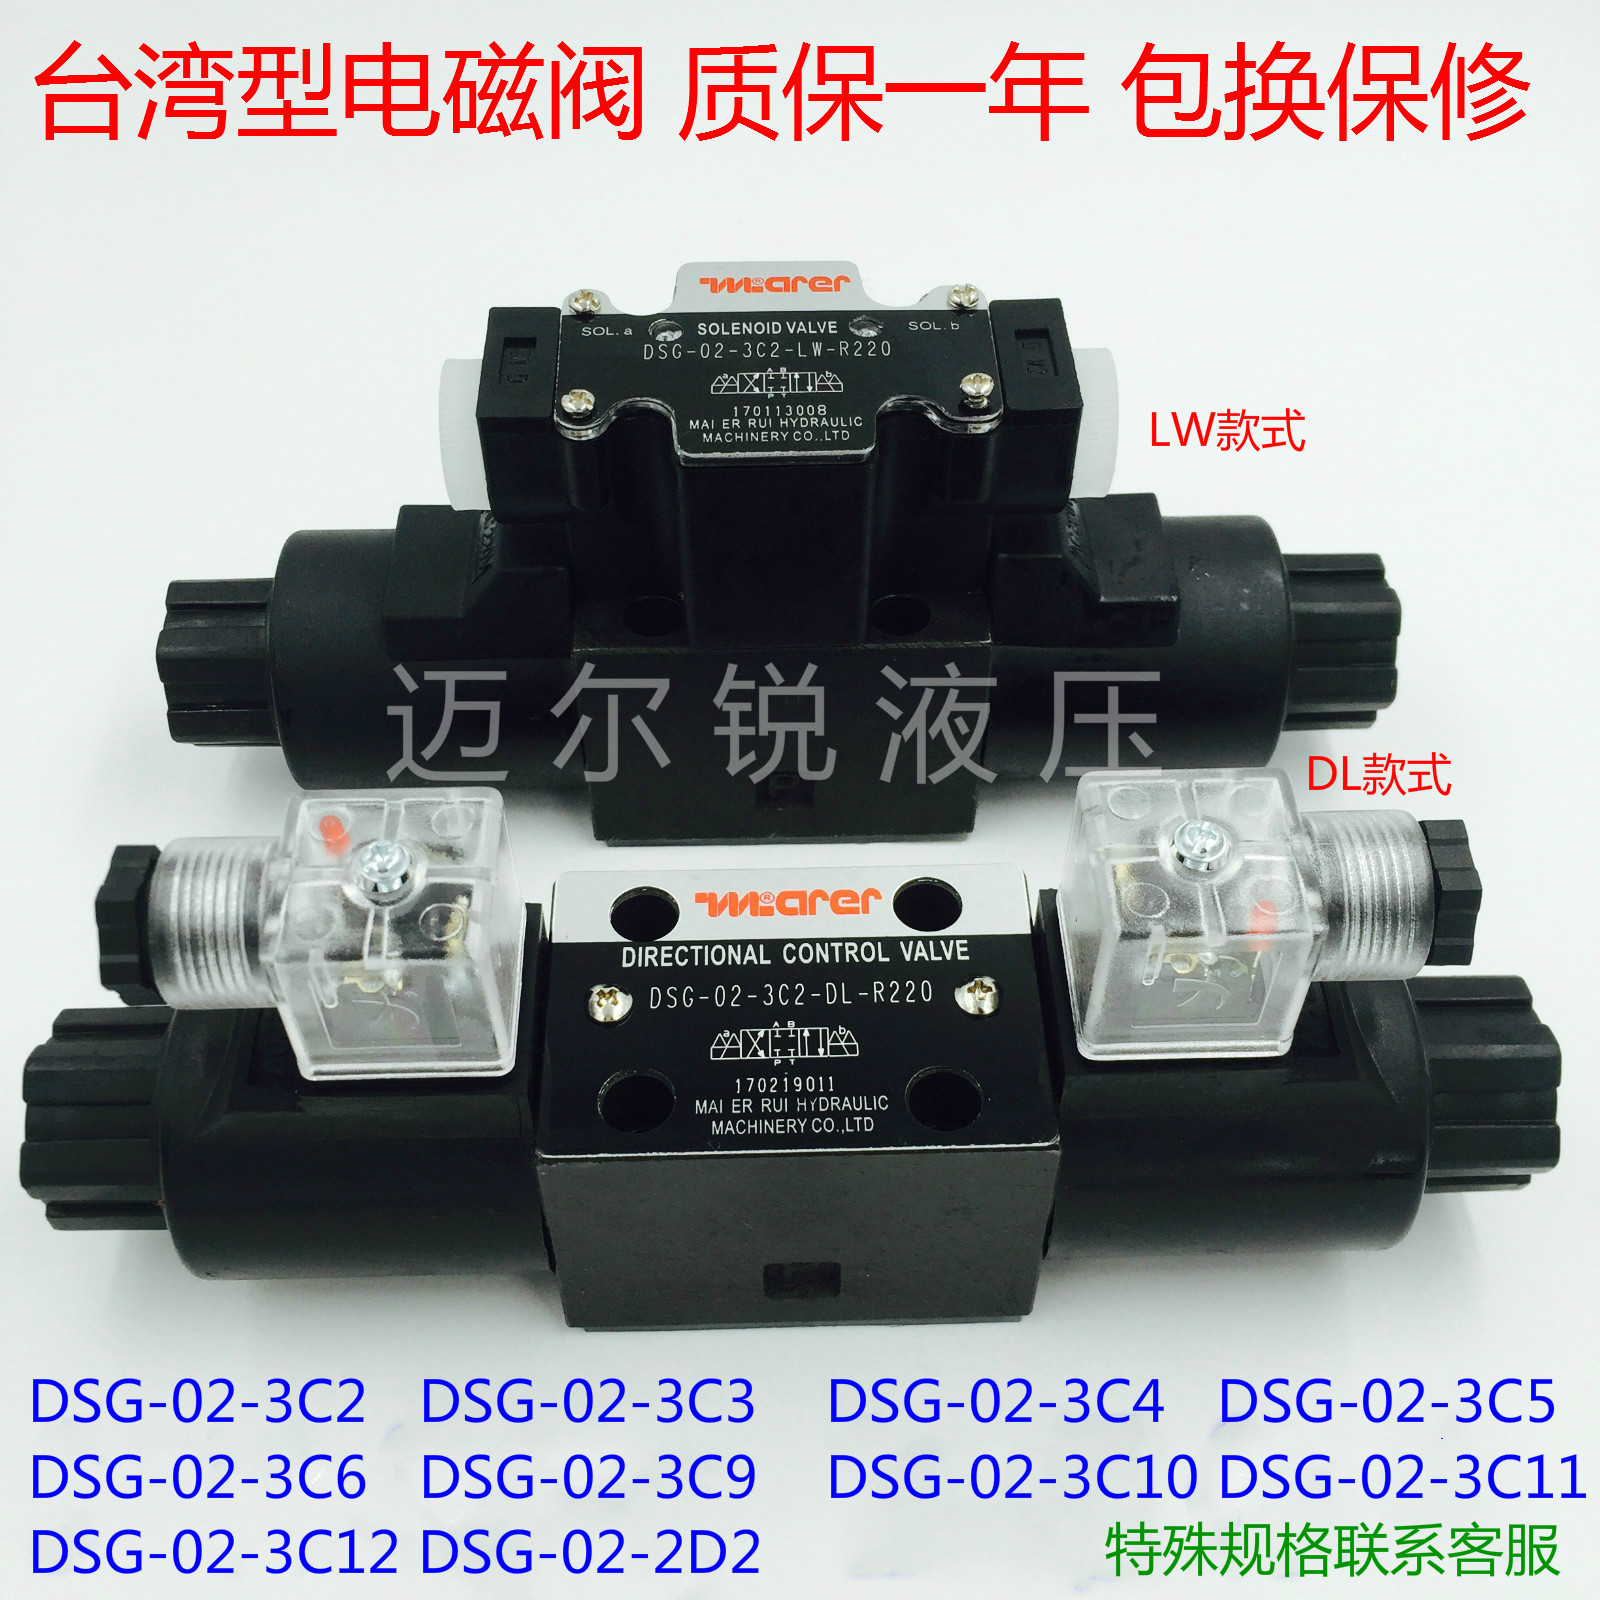 液压电磁阀DSG-02-3C2-DL-D24V 2D2 3C3 3C4 3C6 3C10 3C12 LW